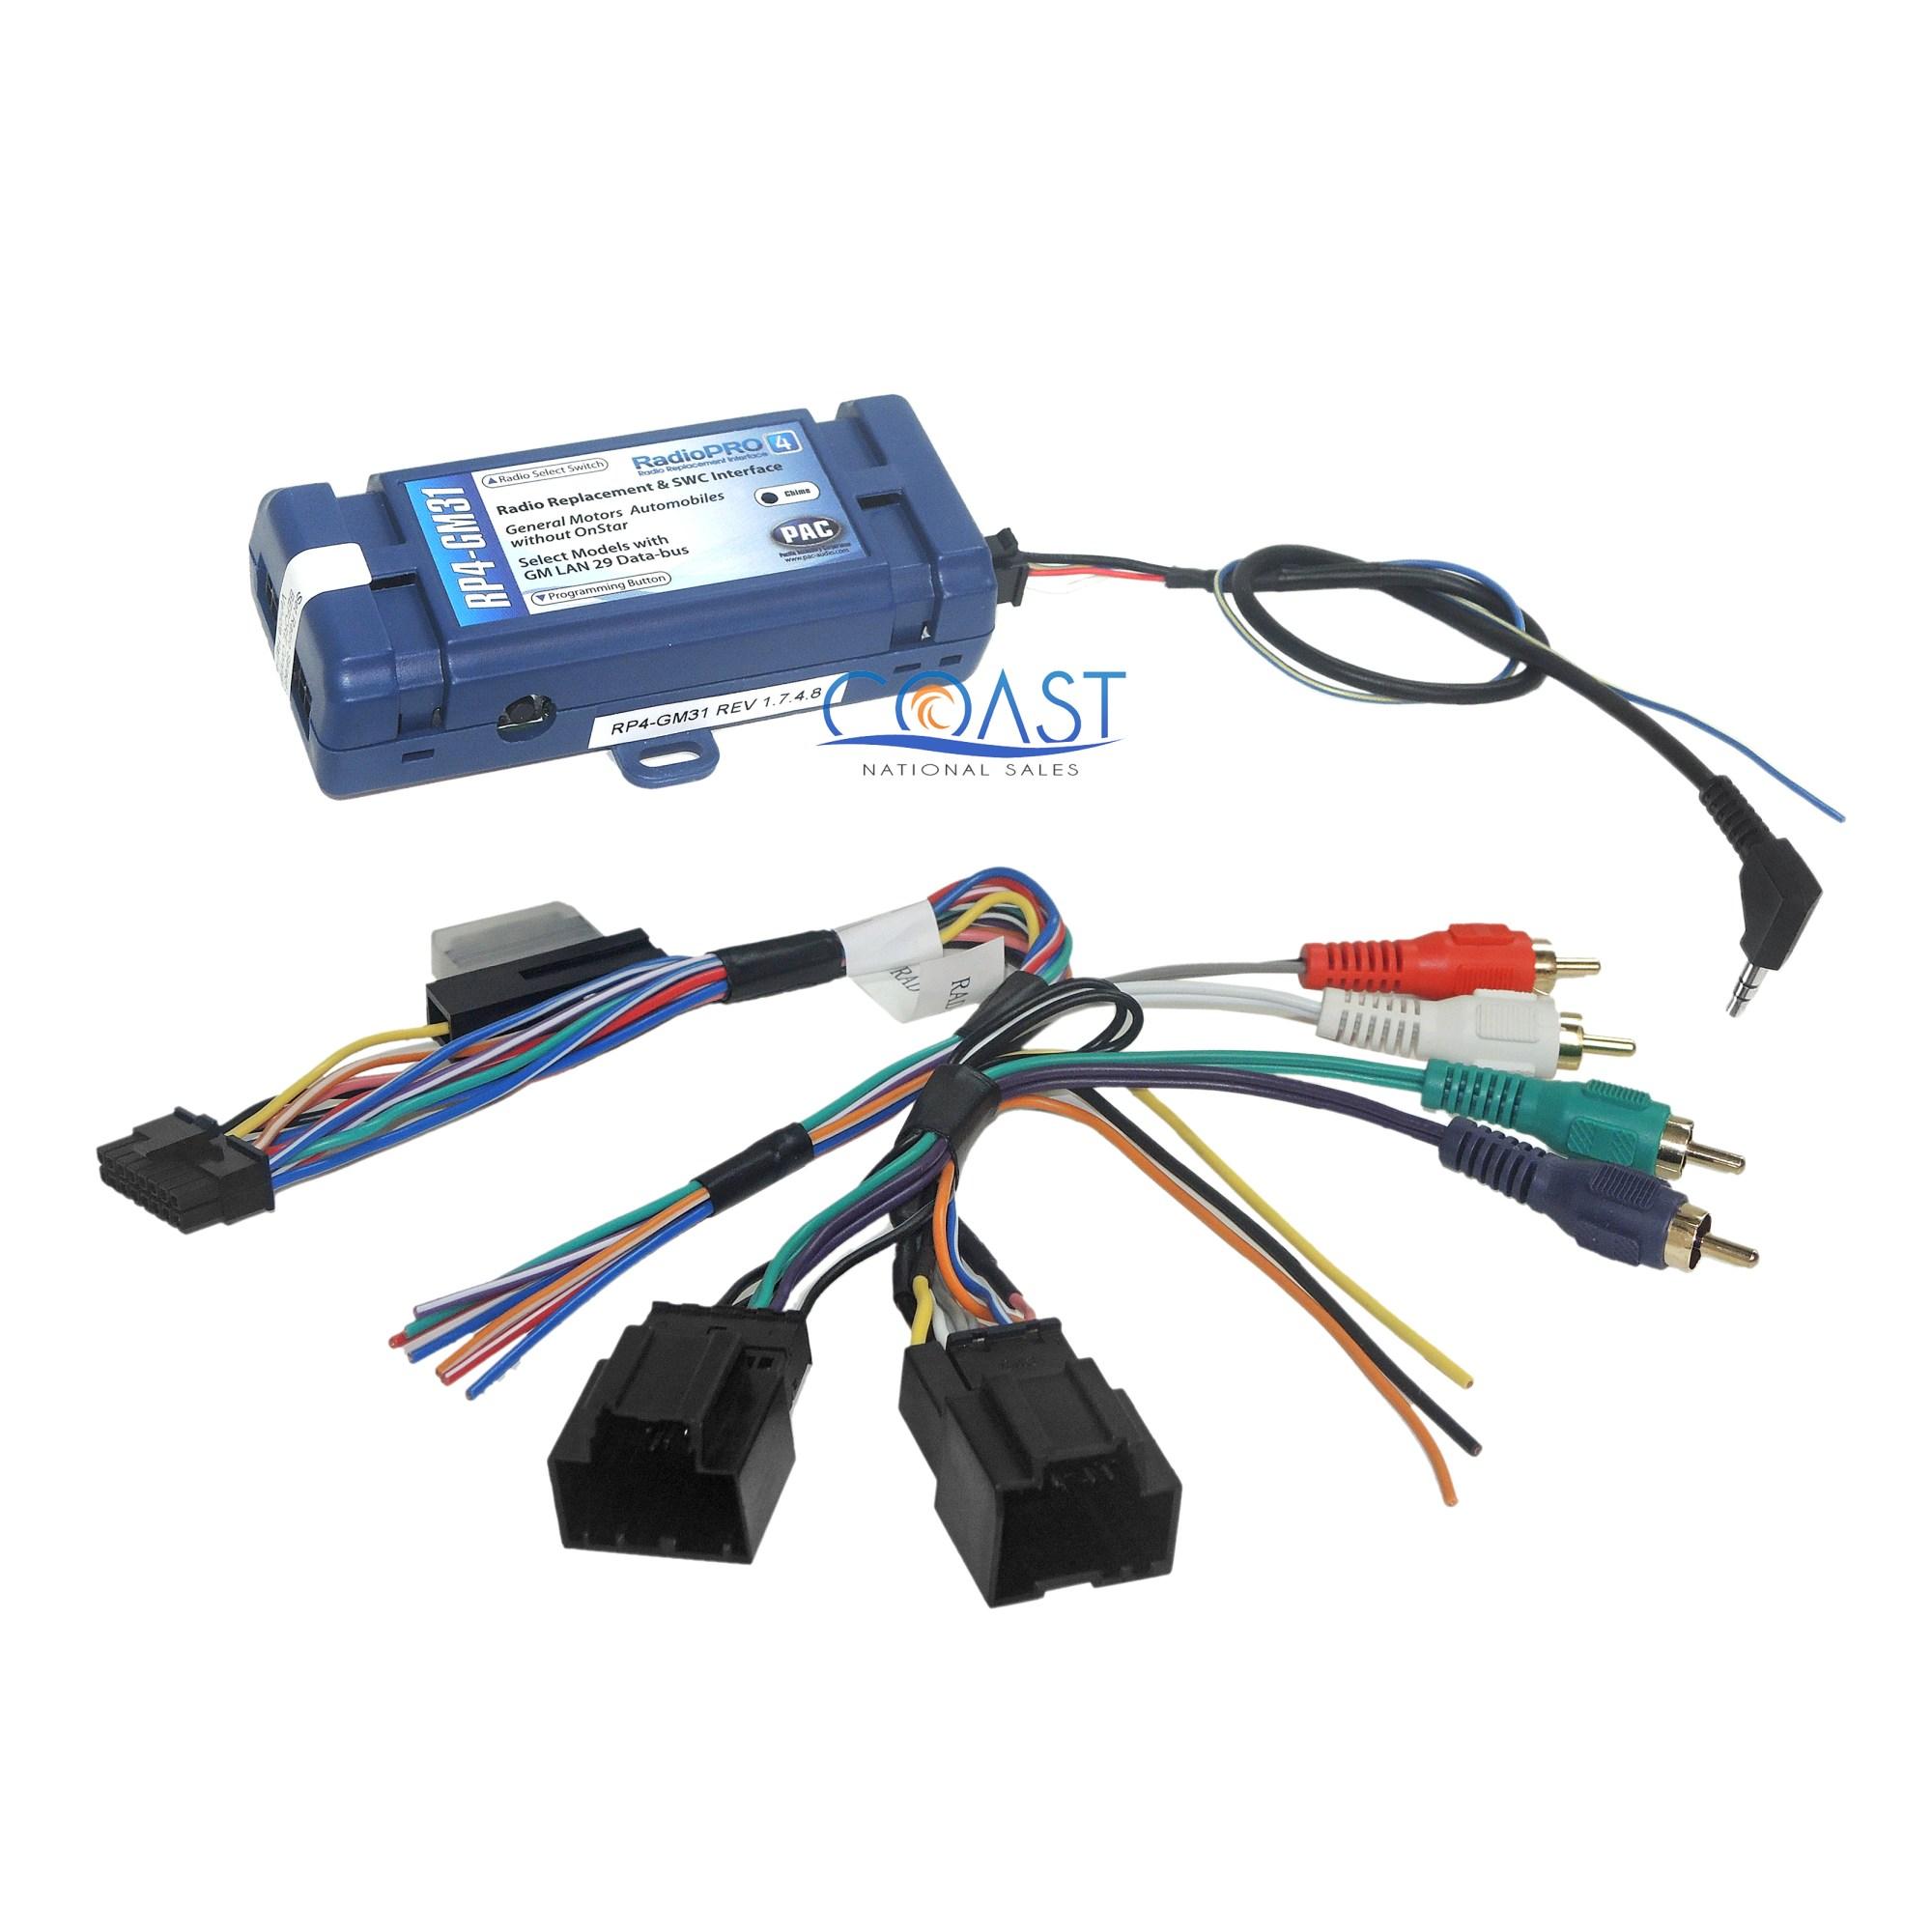 hight resolution of gm car radio stereo harness interface w steering wheel retention gm car radio stereo harness interface